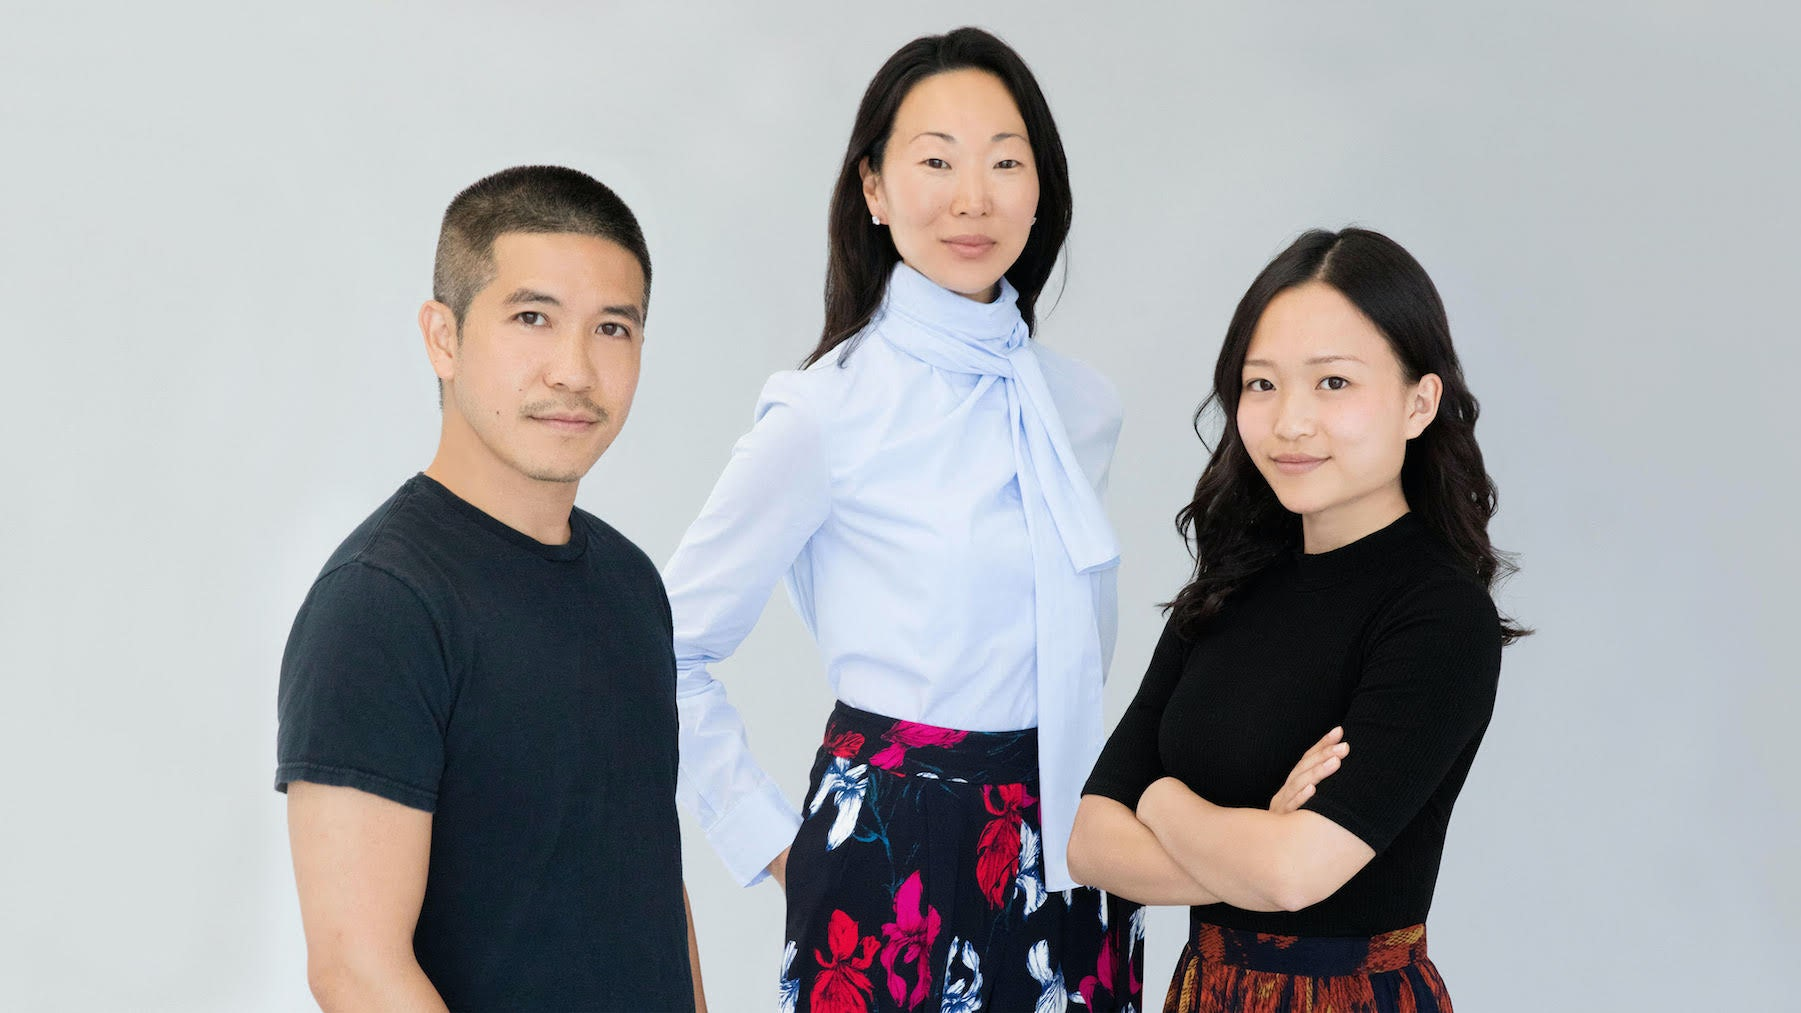 Chief creative officer Thakoon Panichgul, president Lucy Yi and executive chairman Vivian Chou | Source: Courtesy of Thakoon